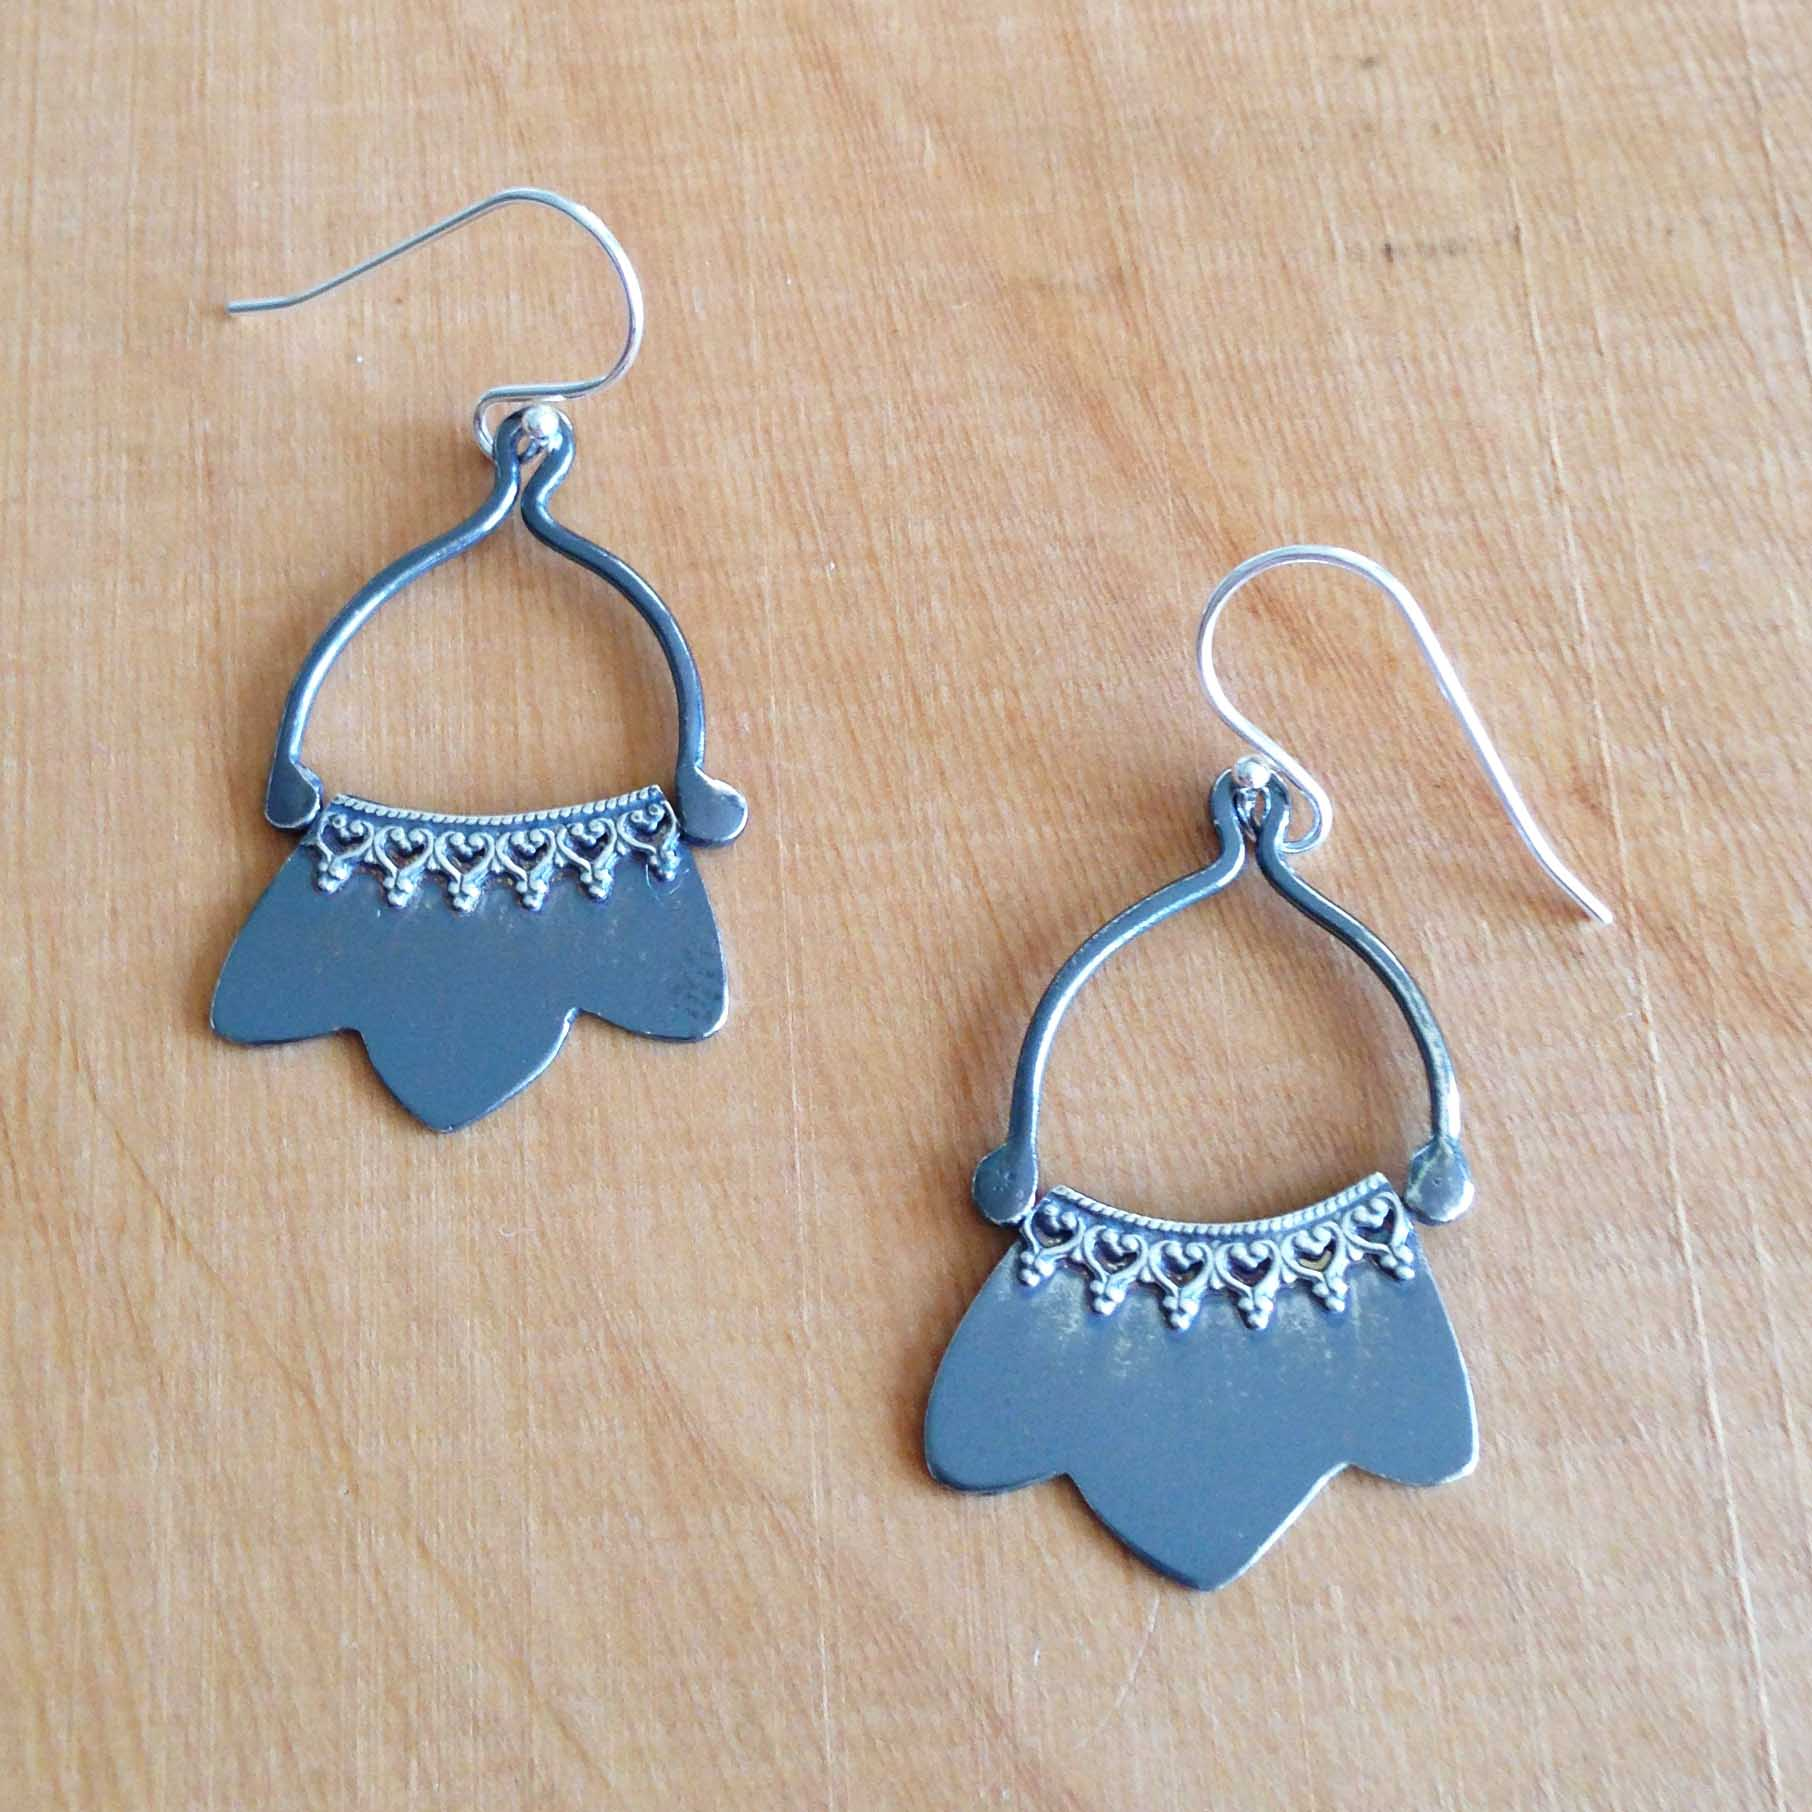 blacklace-blossom-earrings